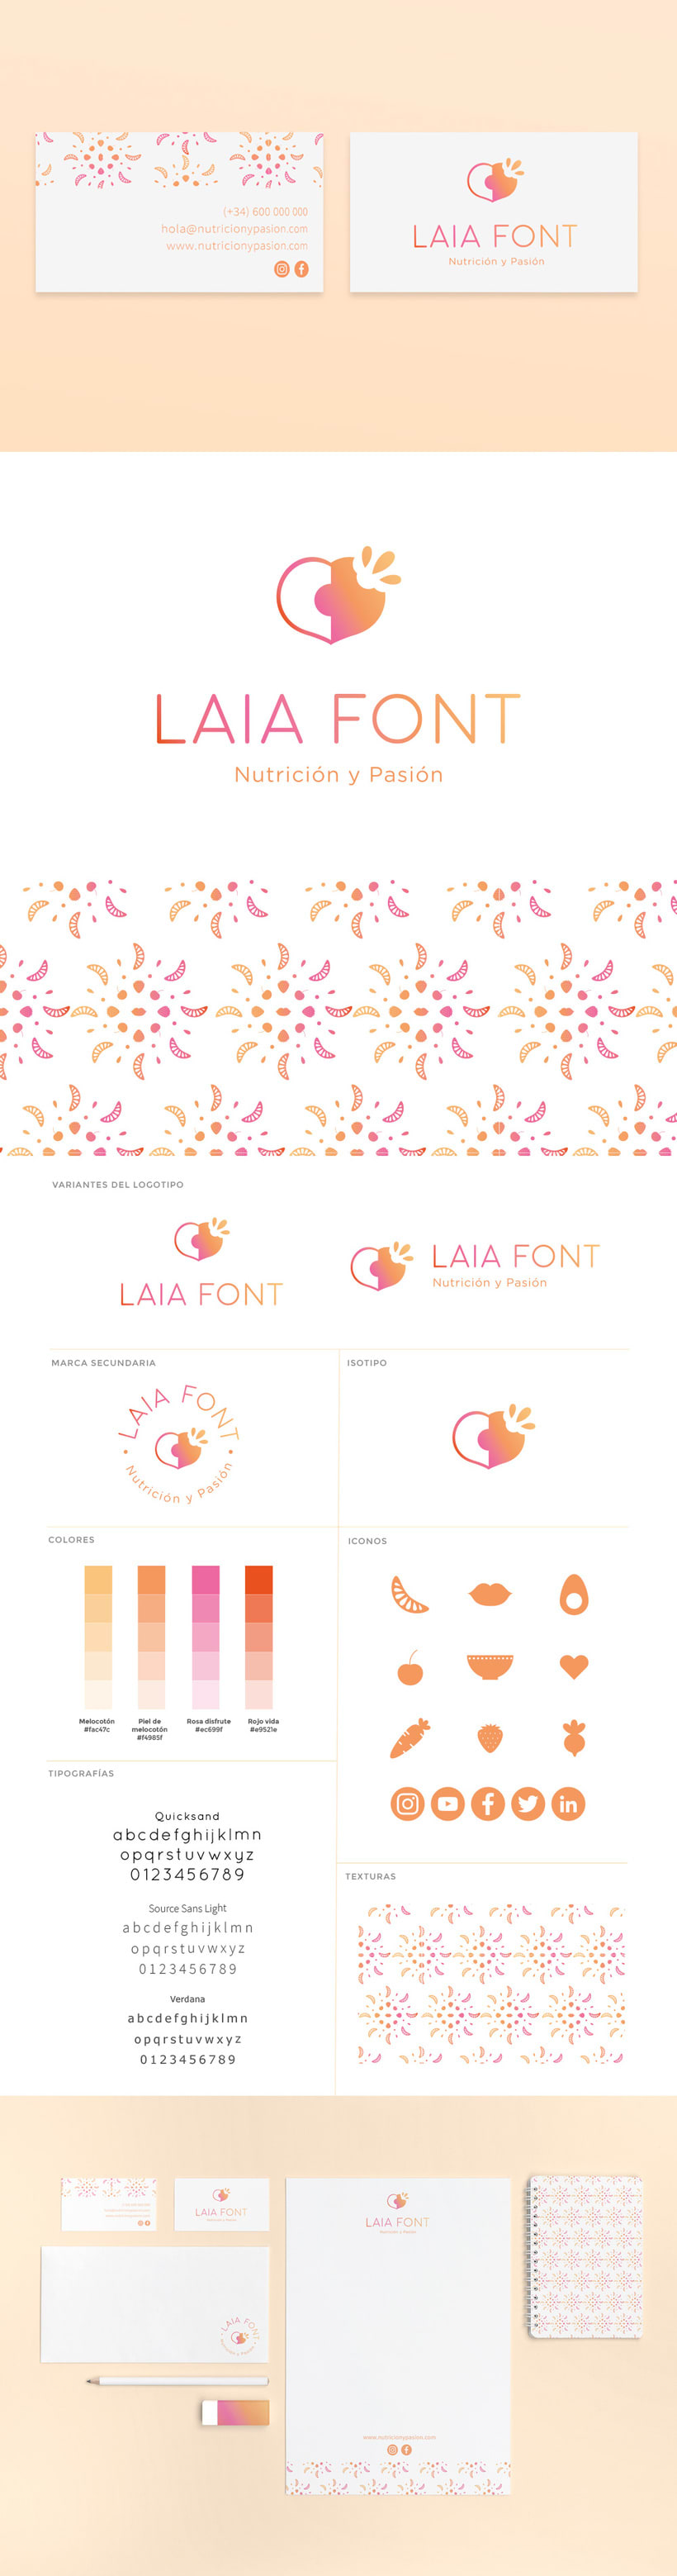 Branding Laia Font -1